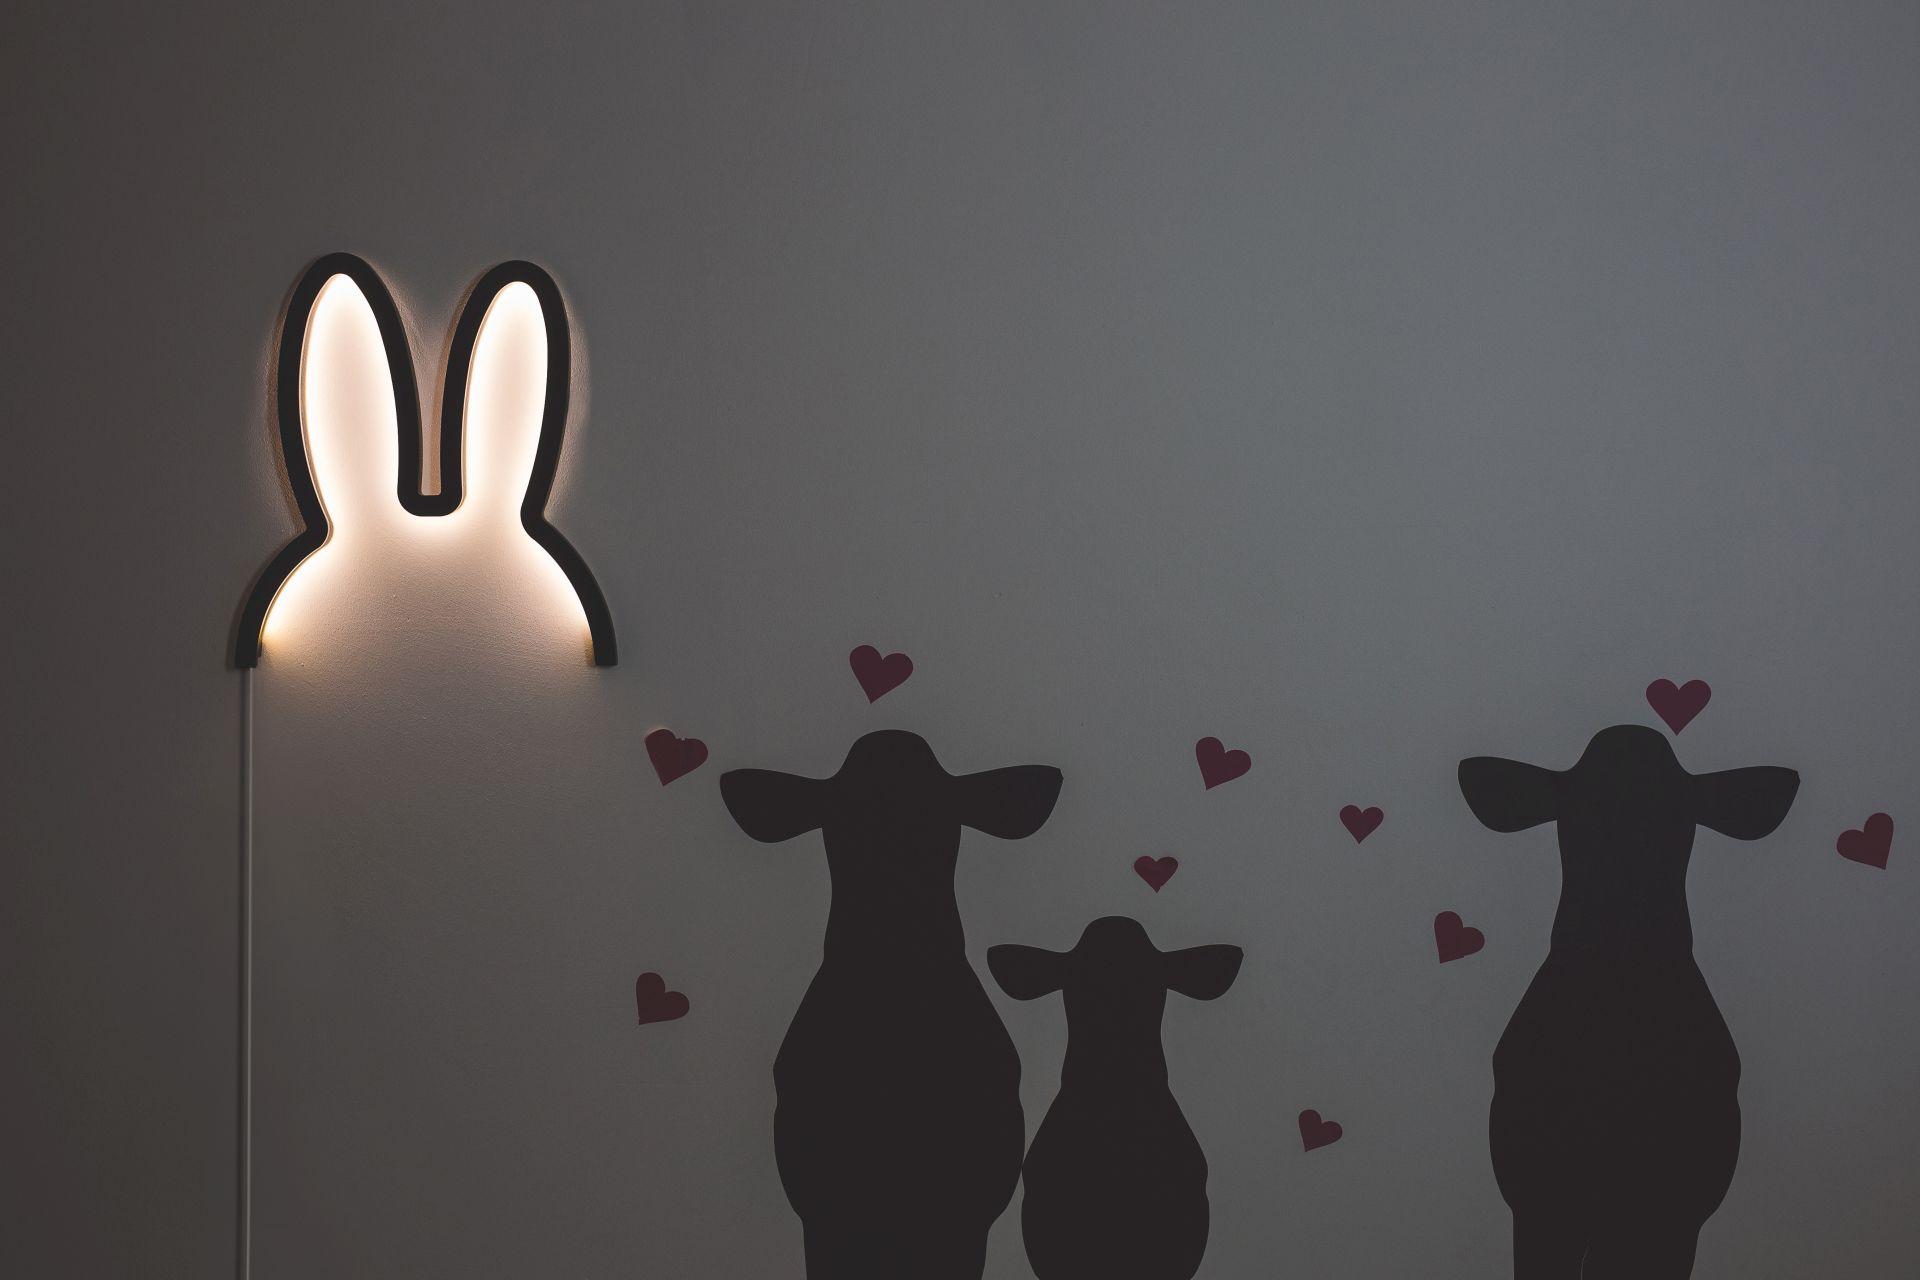 Lampe Veilleuse Lapin Miffy lampe veilleuse - les oreilles de miffy